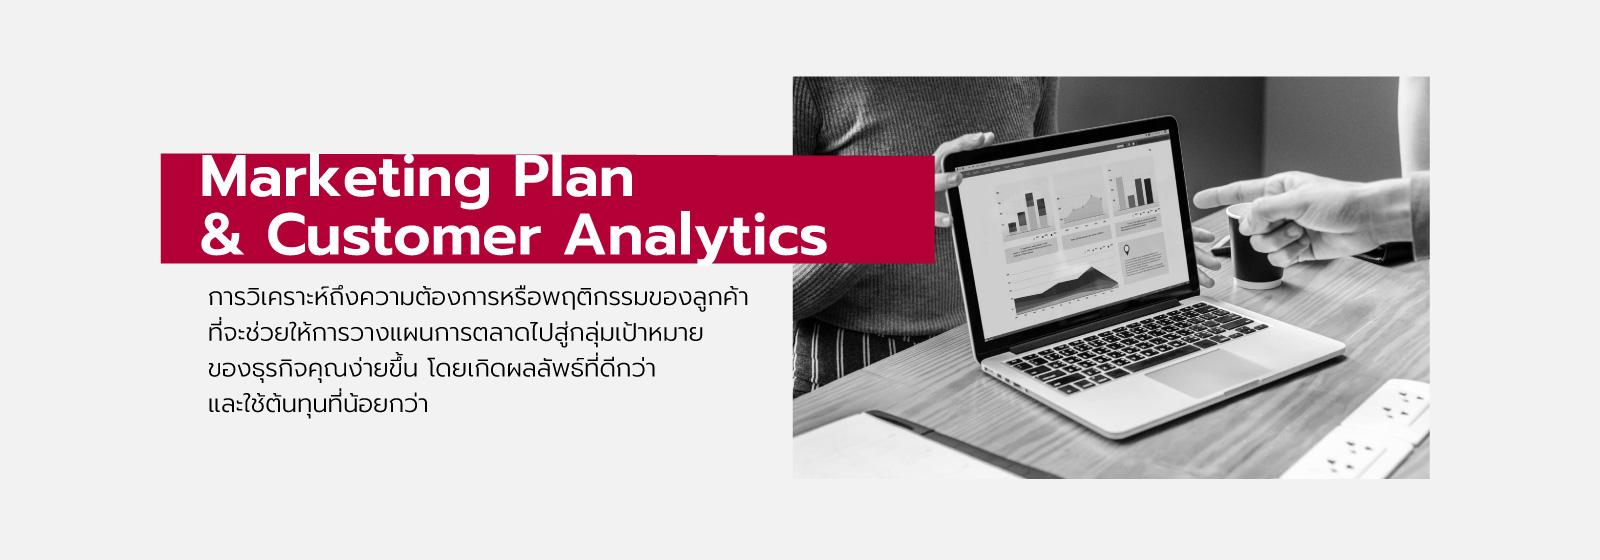 Marketing plan & Customer Analytics